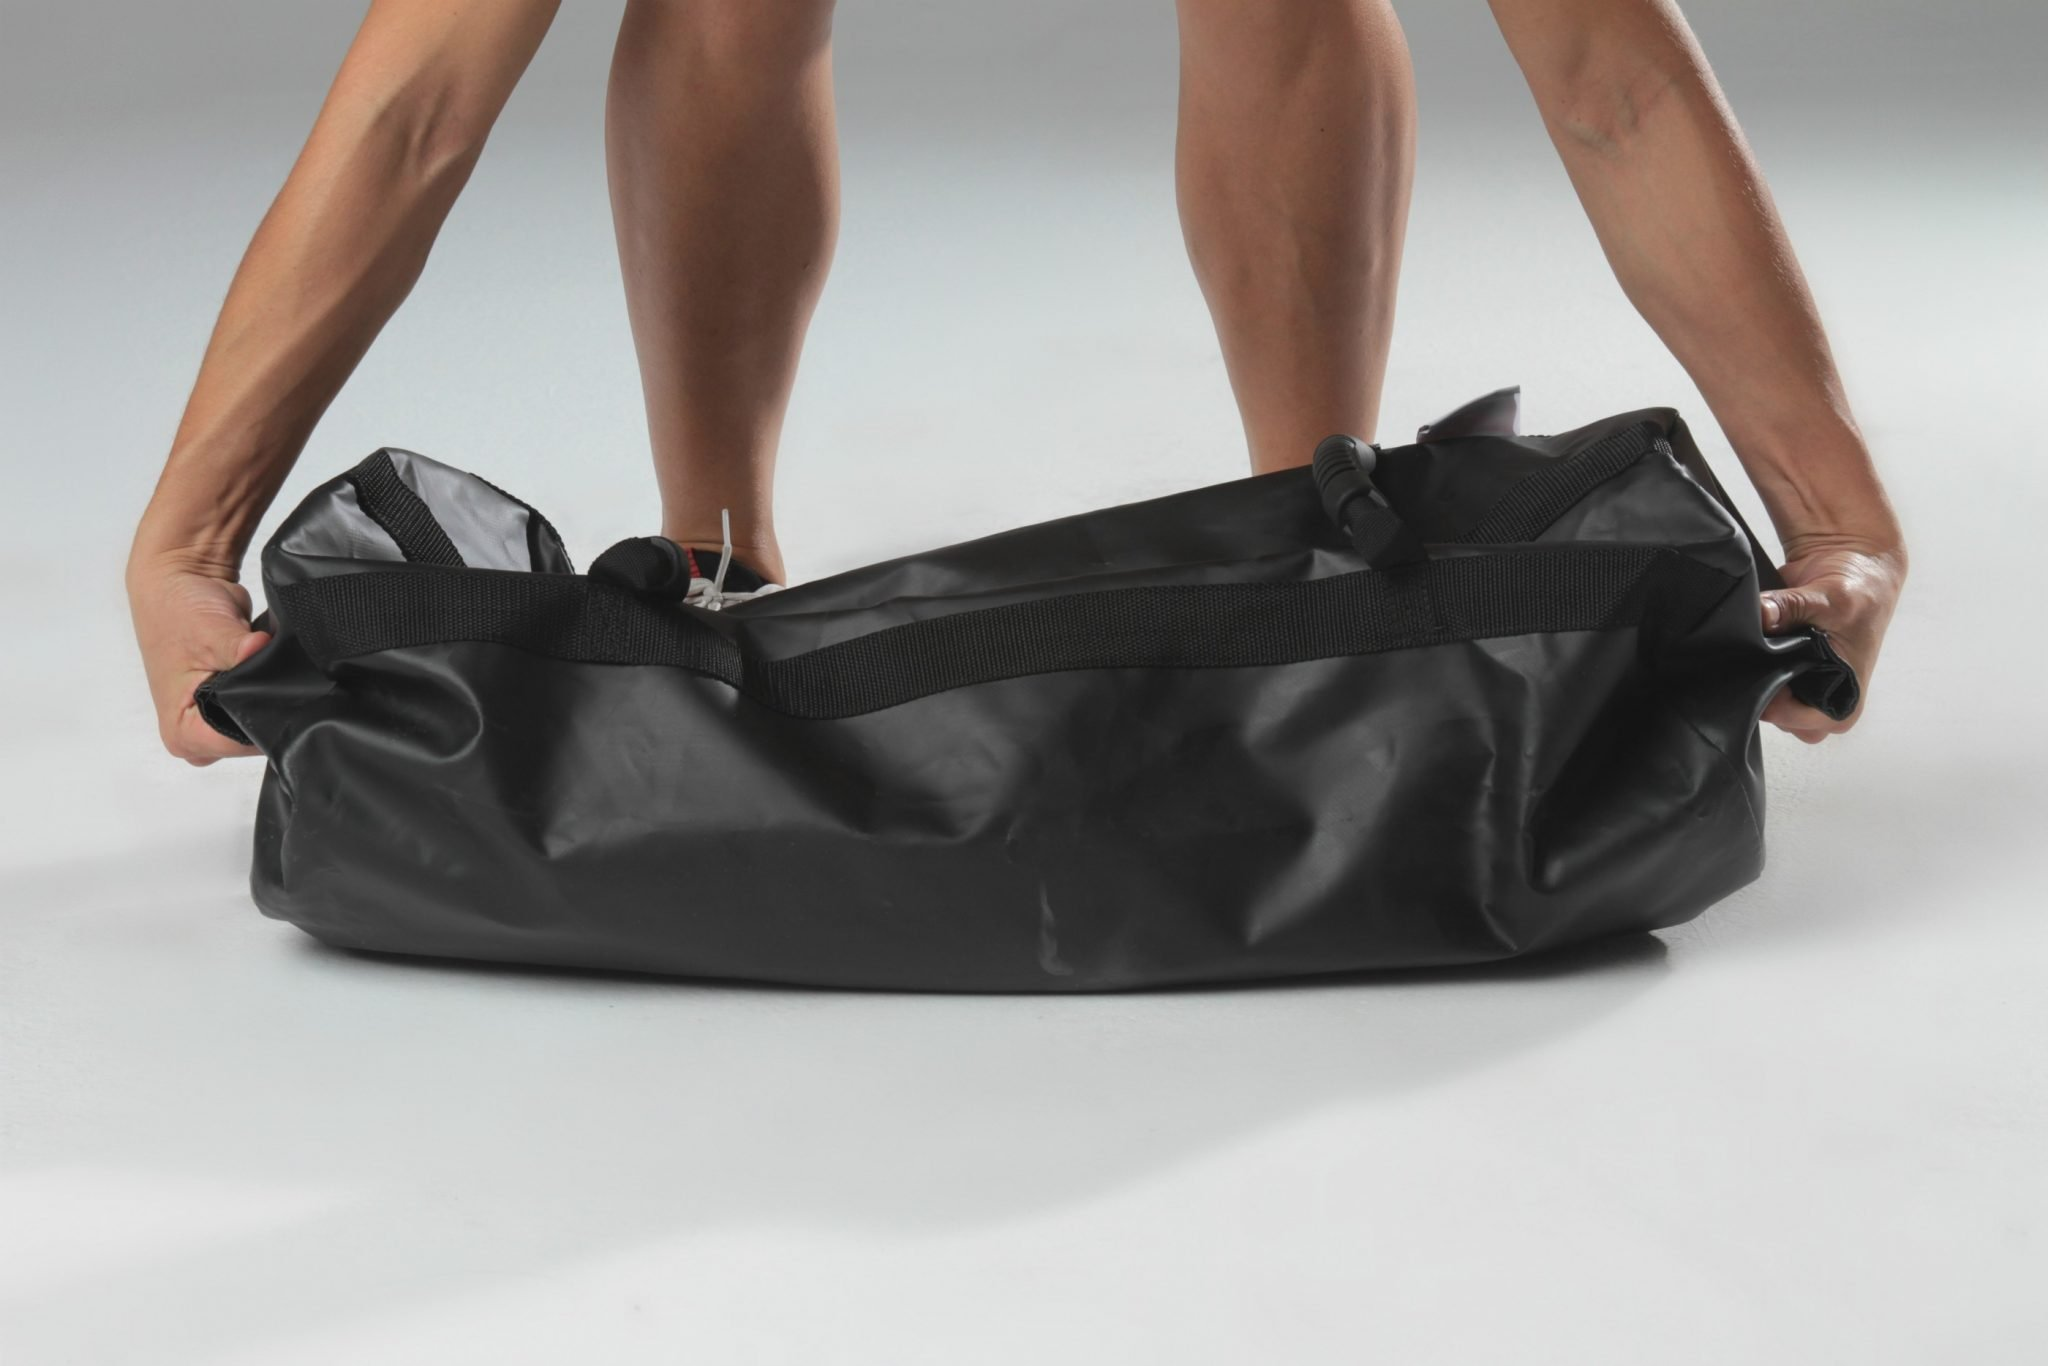 Ultimate Sandbag Training: Burly Package by Ultimate Sandbag (Image #2)